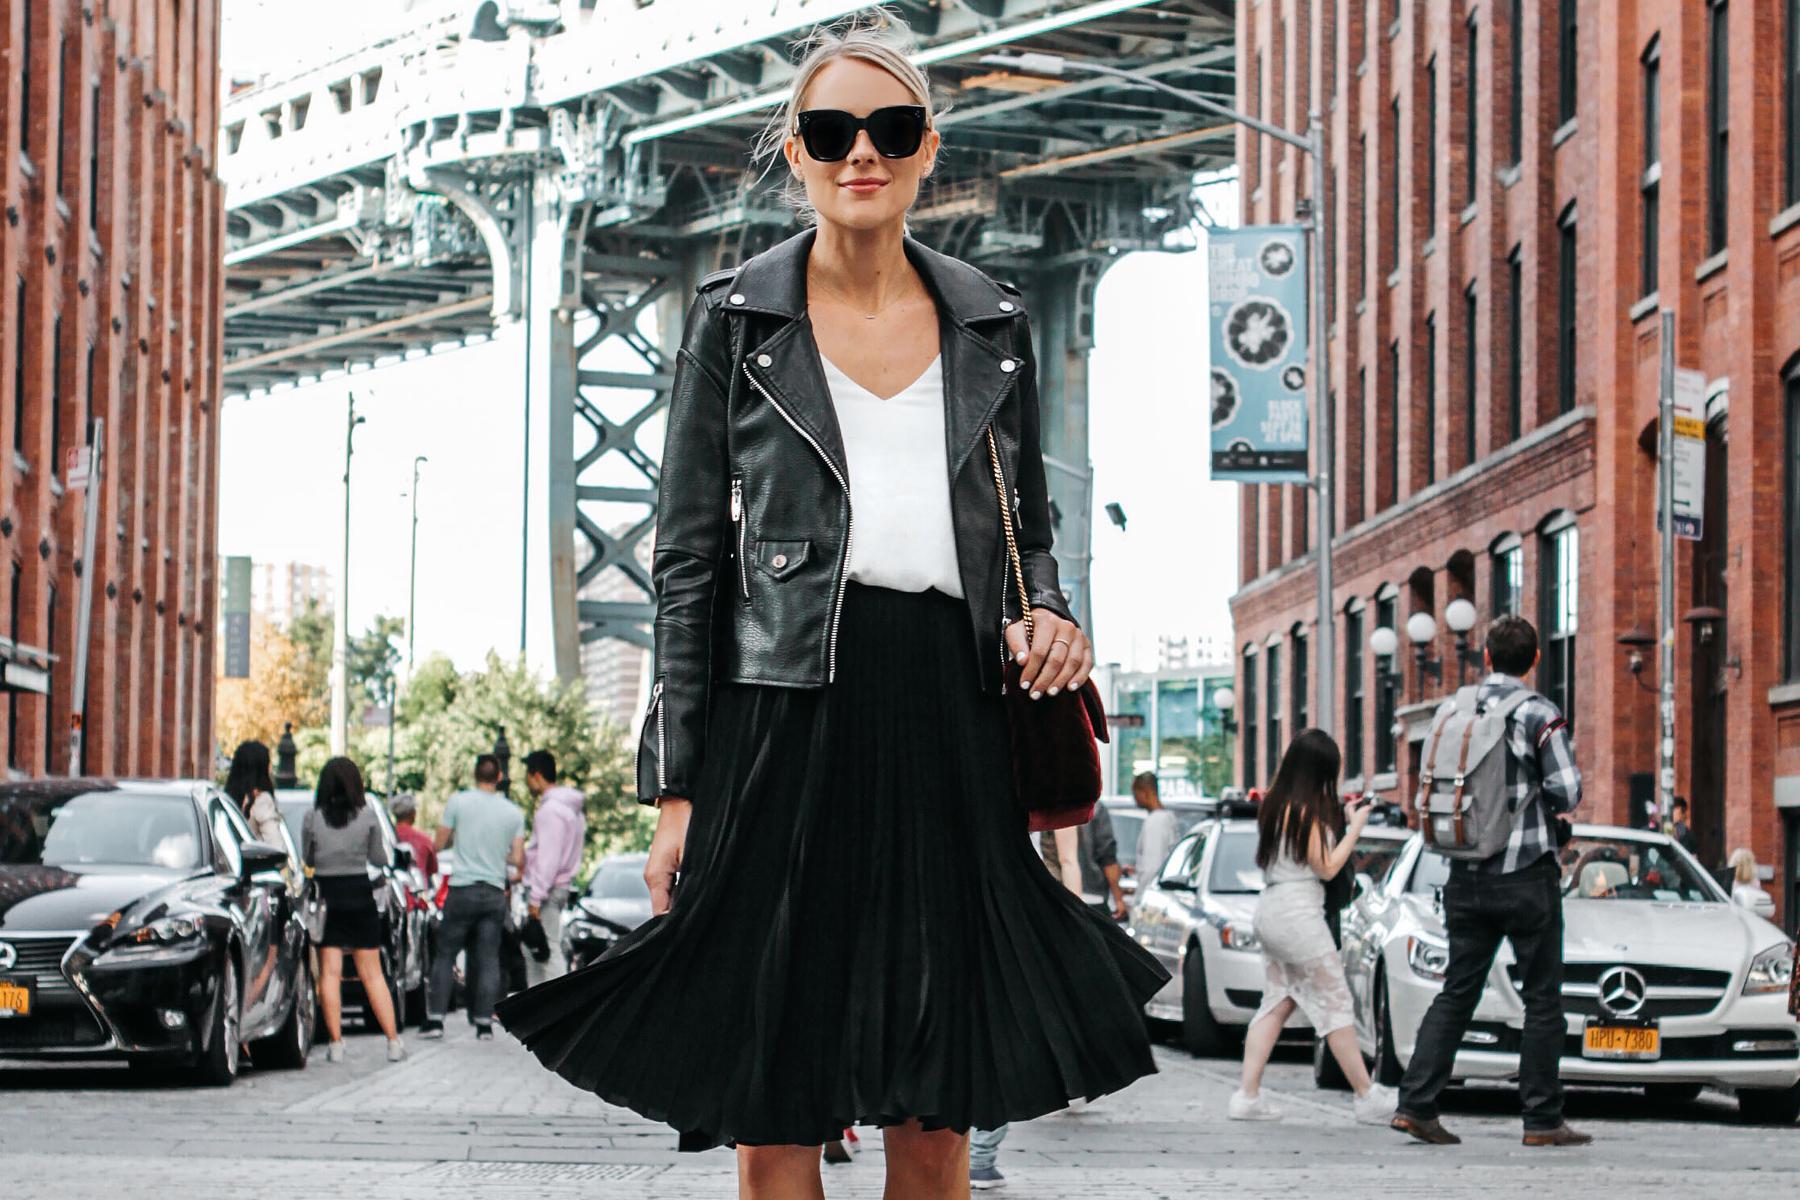 Blonde Woman Wearing Black Leather Jacket Black Pleated Midi Skirt Fashion Jackson Dallas Blogger Fashion Blogger Street Style NYFW Dumbo Bridge